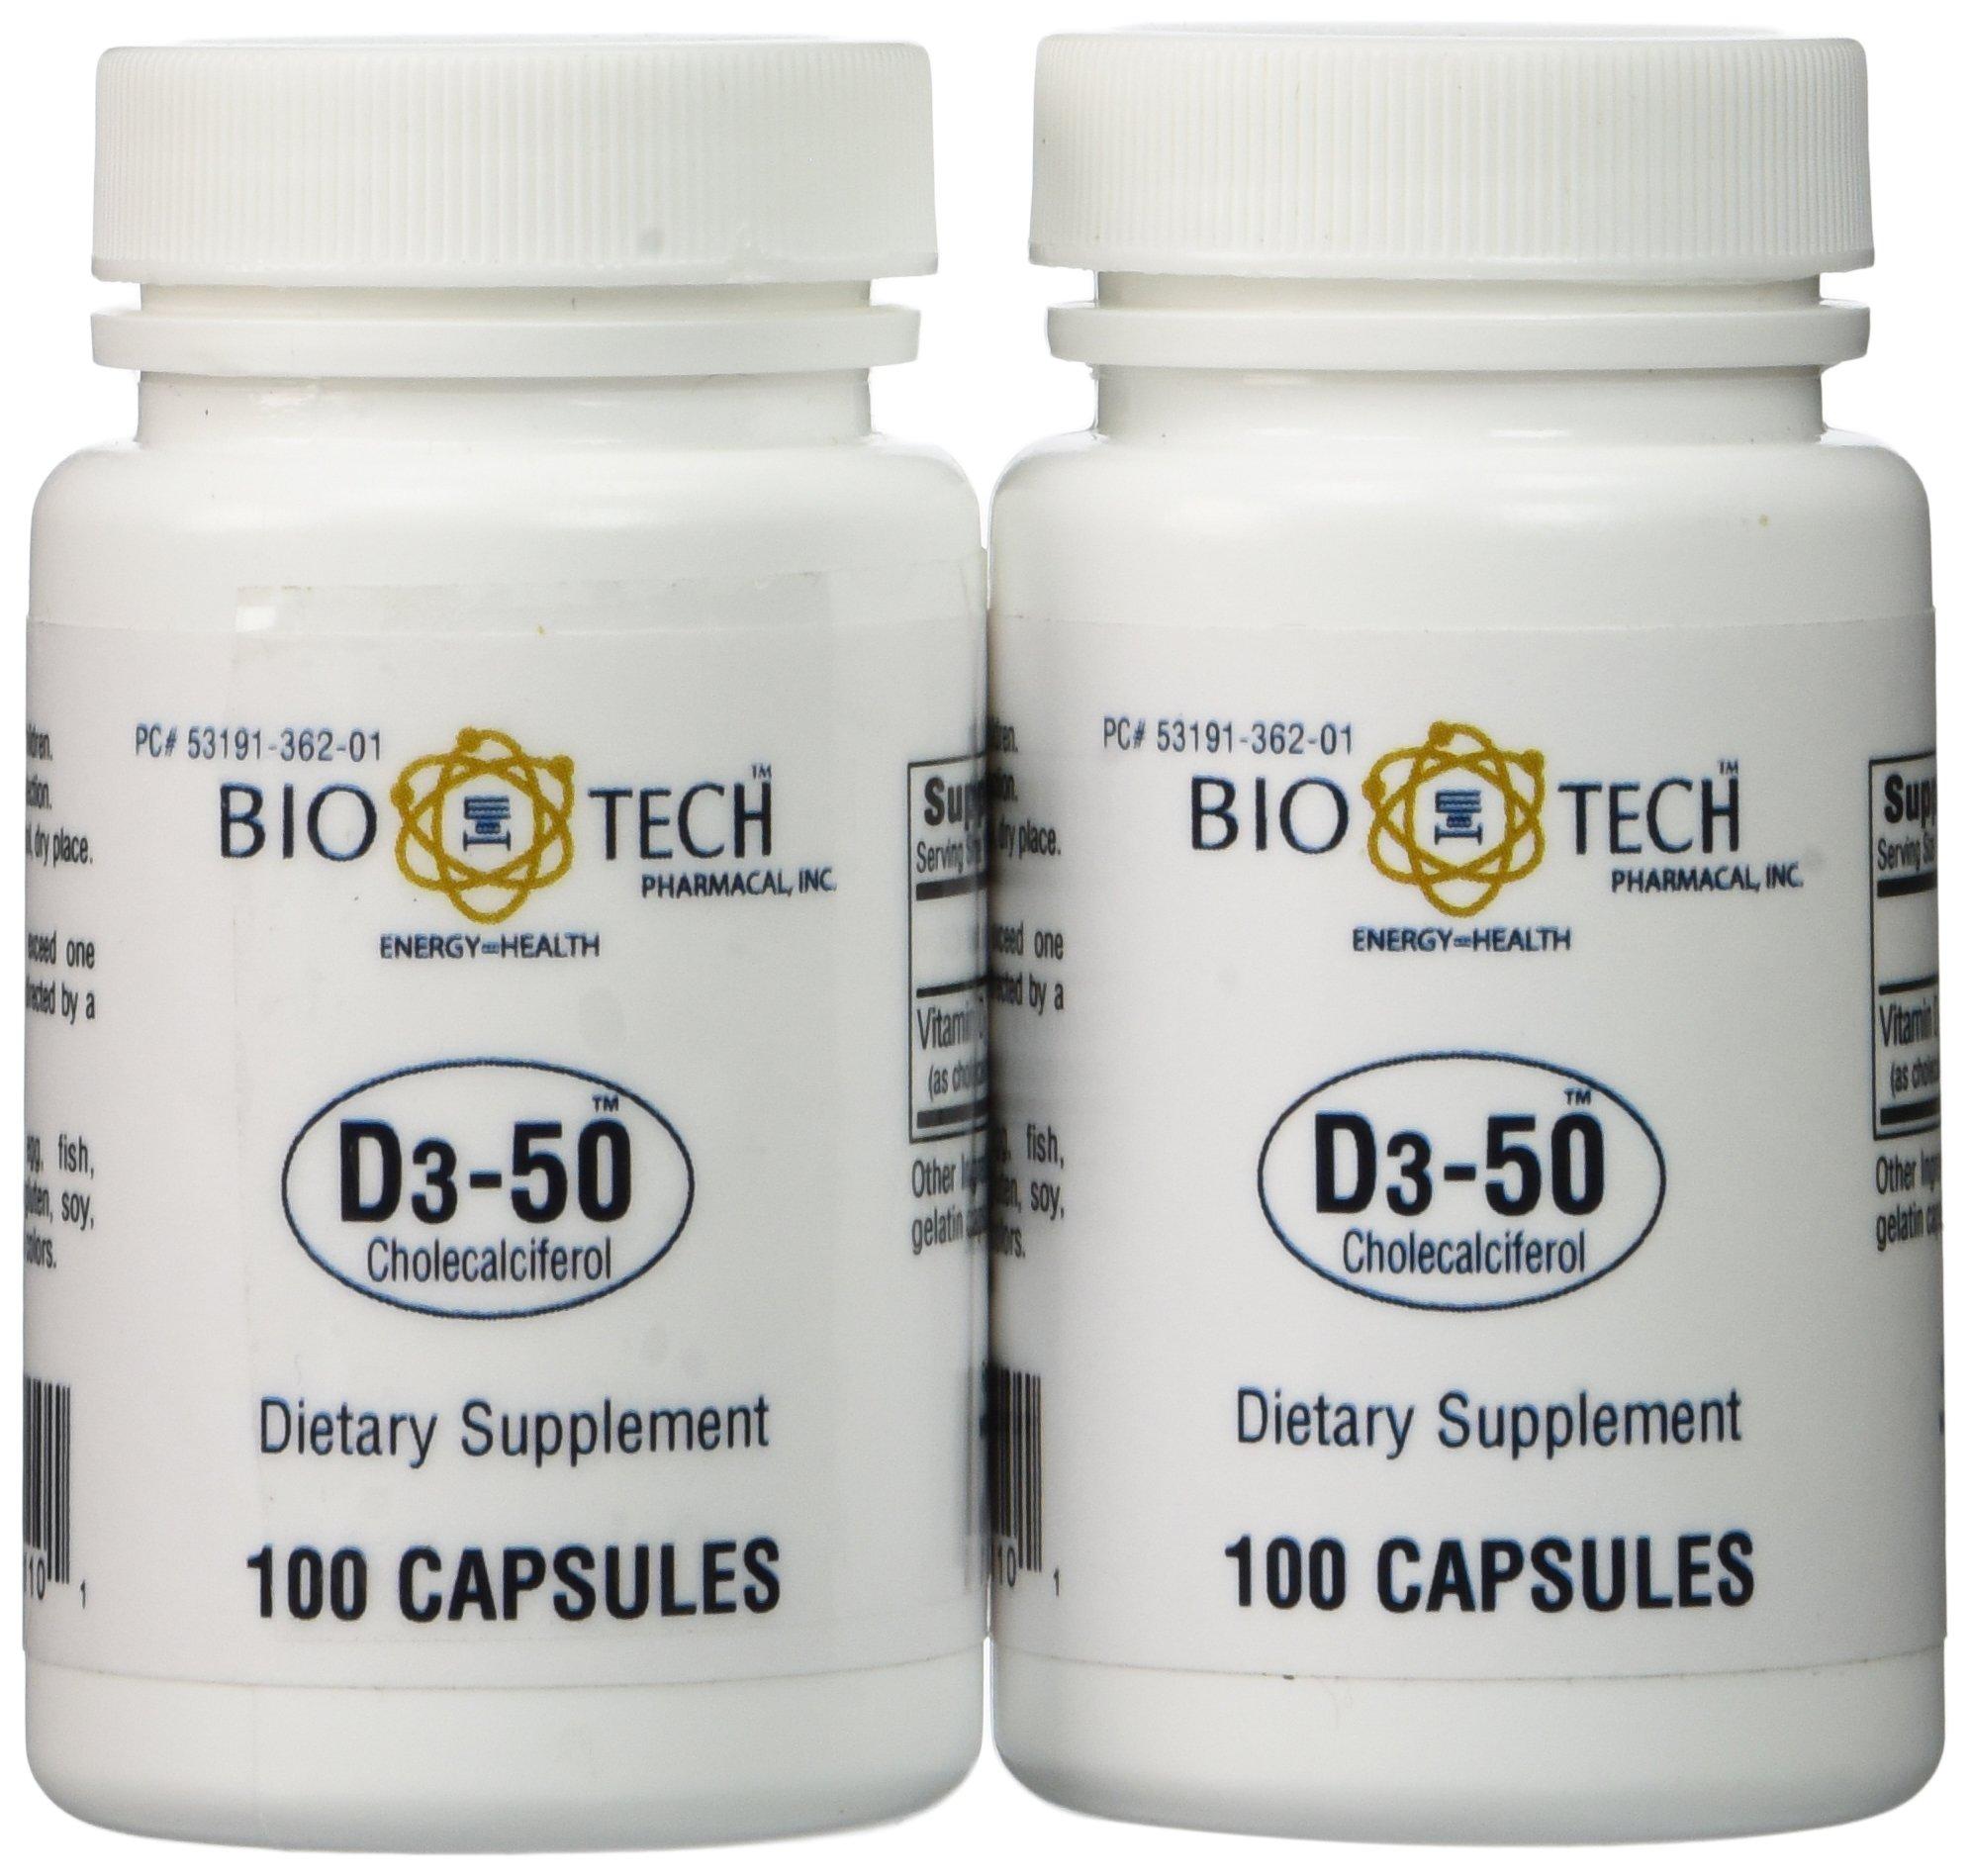 Bio-Tech - D3-50 50,000 IU 200, Pack of 2